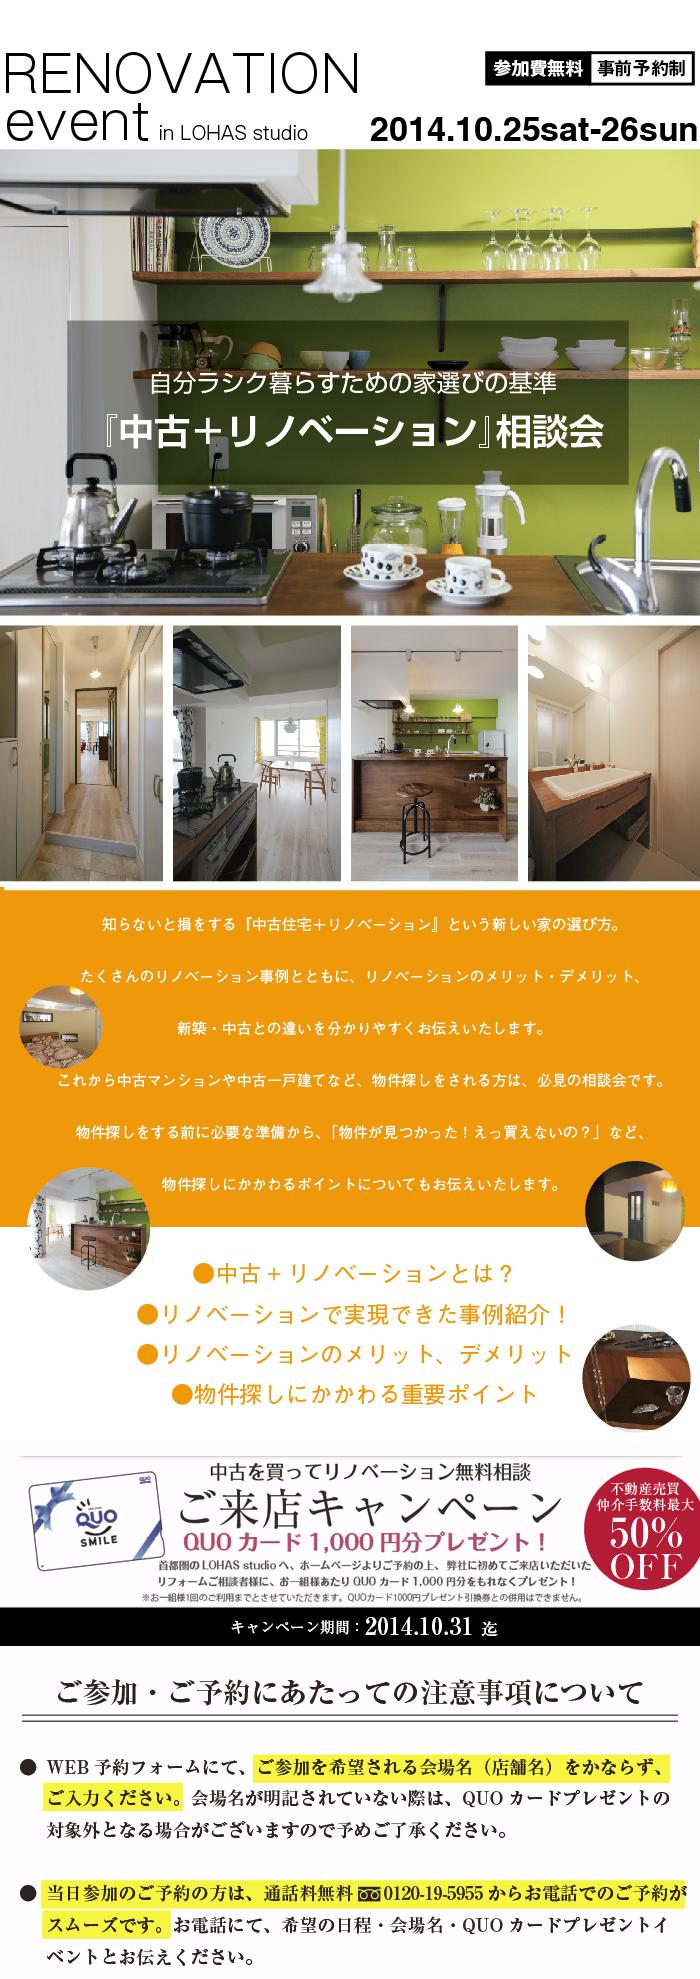 2014102526_renovation_event.png